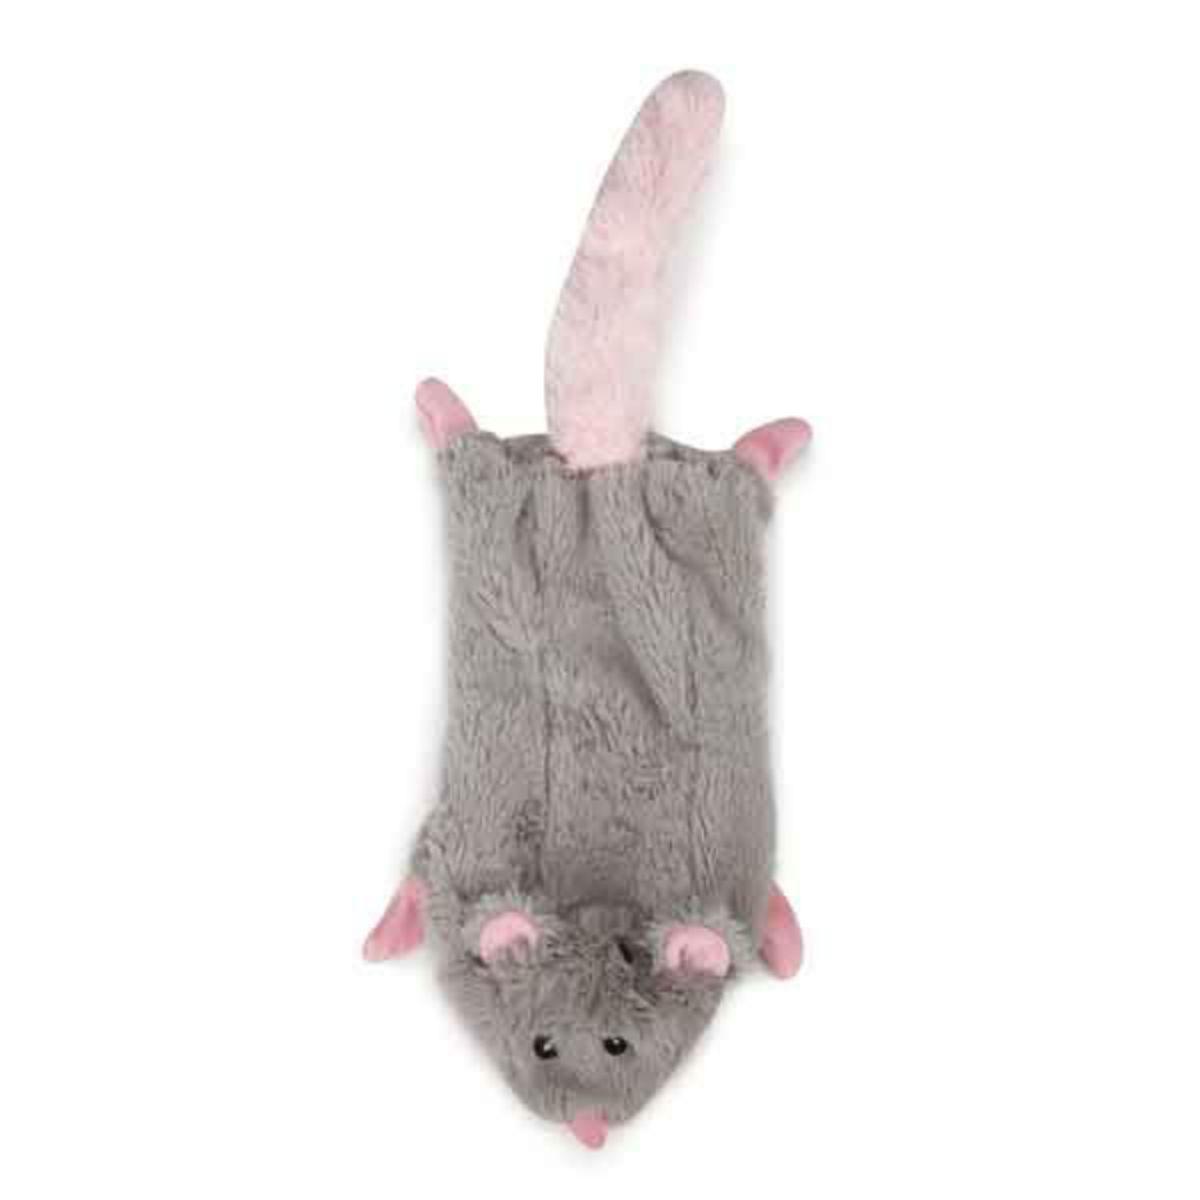 Grriggles Farm Friend Unstuffies Dog Toy - Opossum